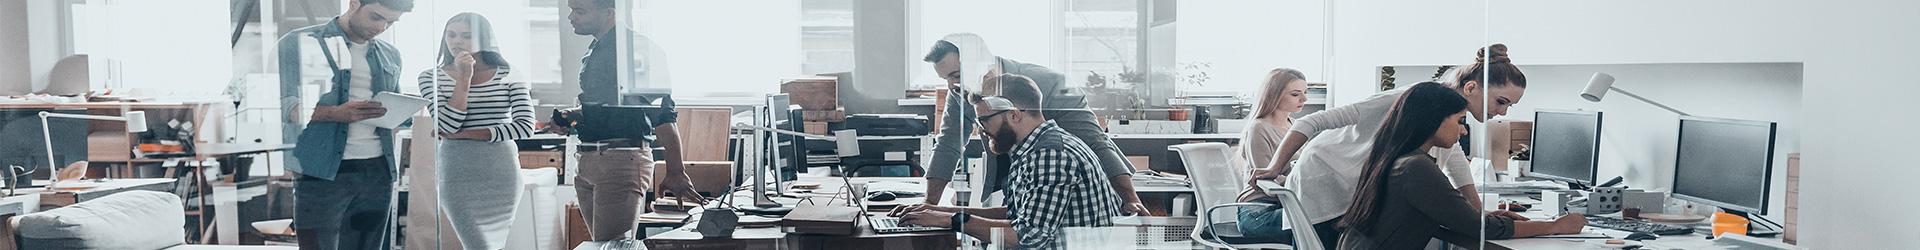 communication-module-header-help-company-communicate